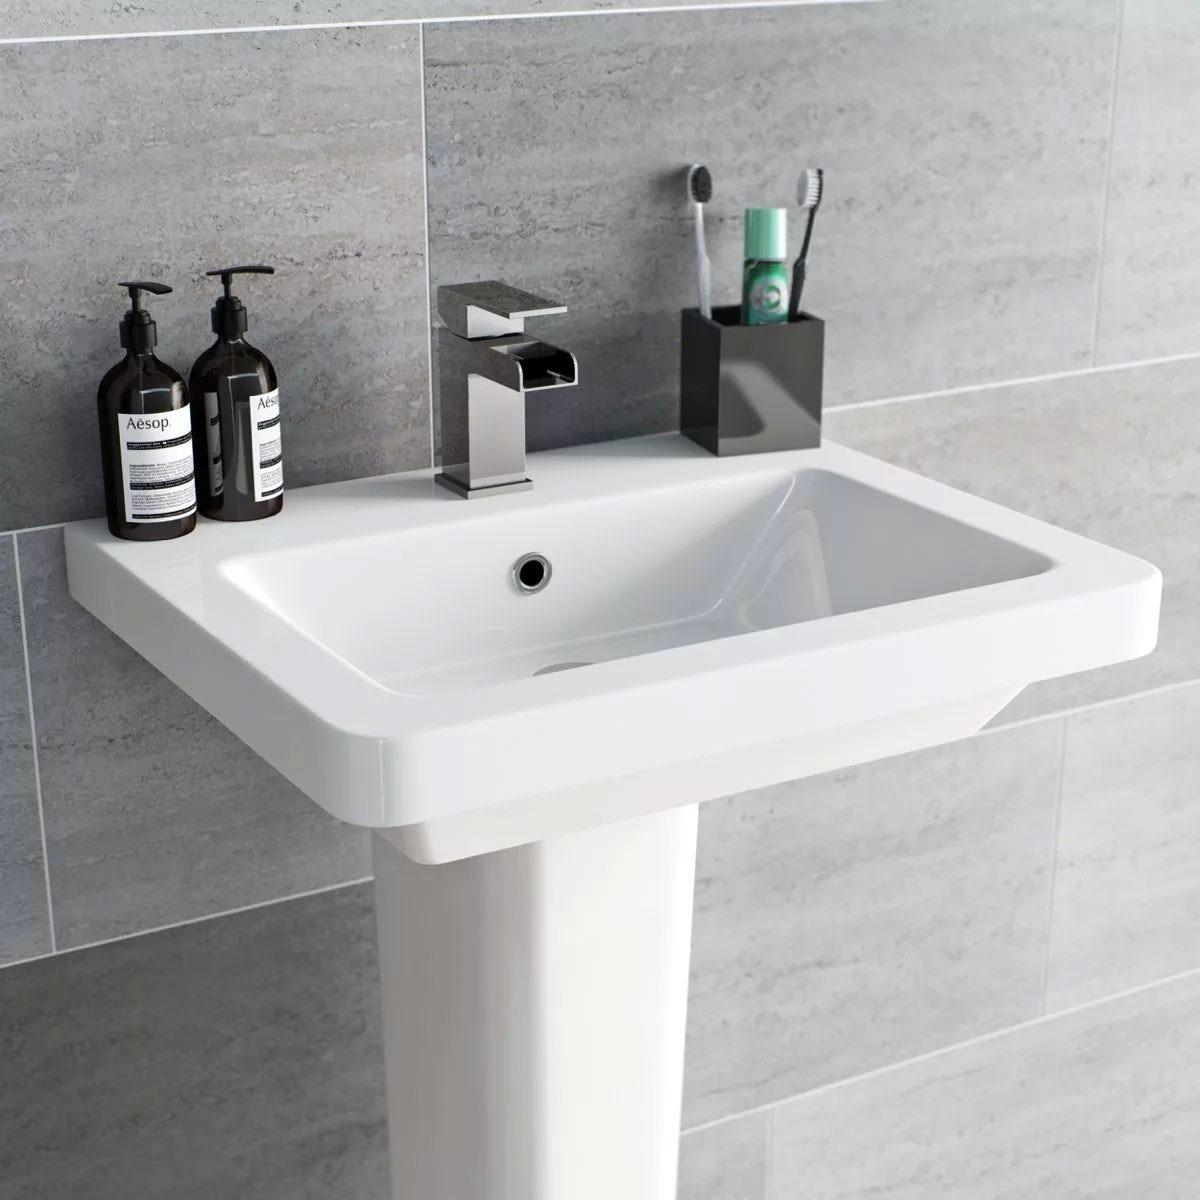 British Ceramic Tile Metropolis mid grey matt tile 248mm x 498mm - Sold by Victoria Plum